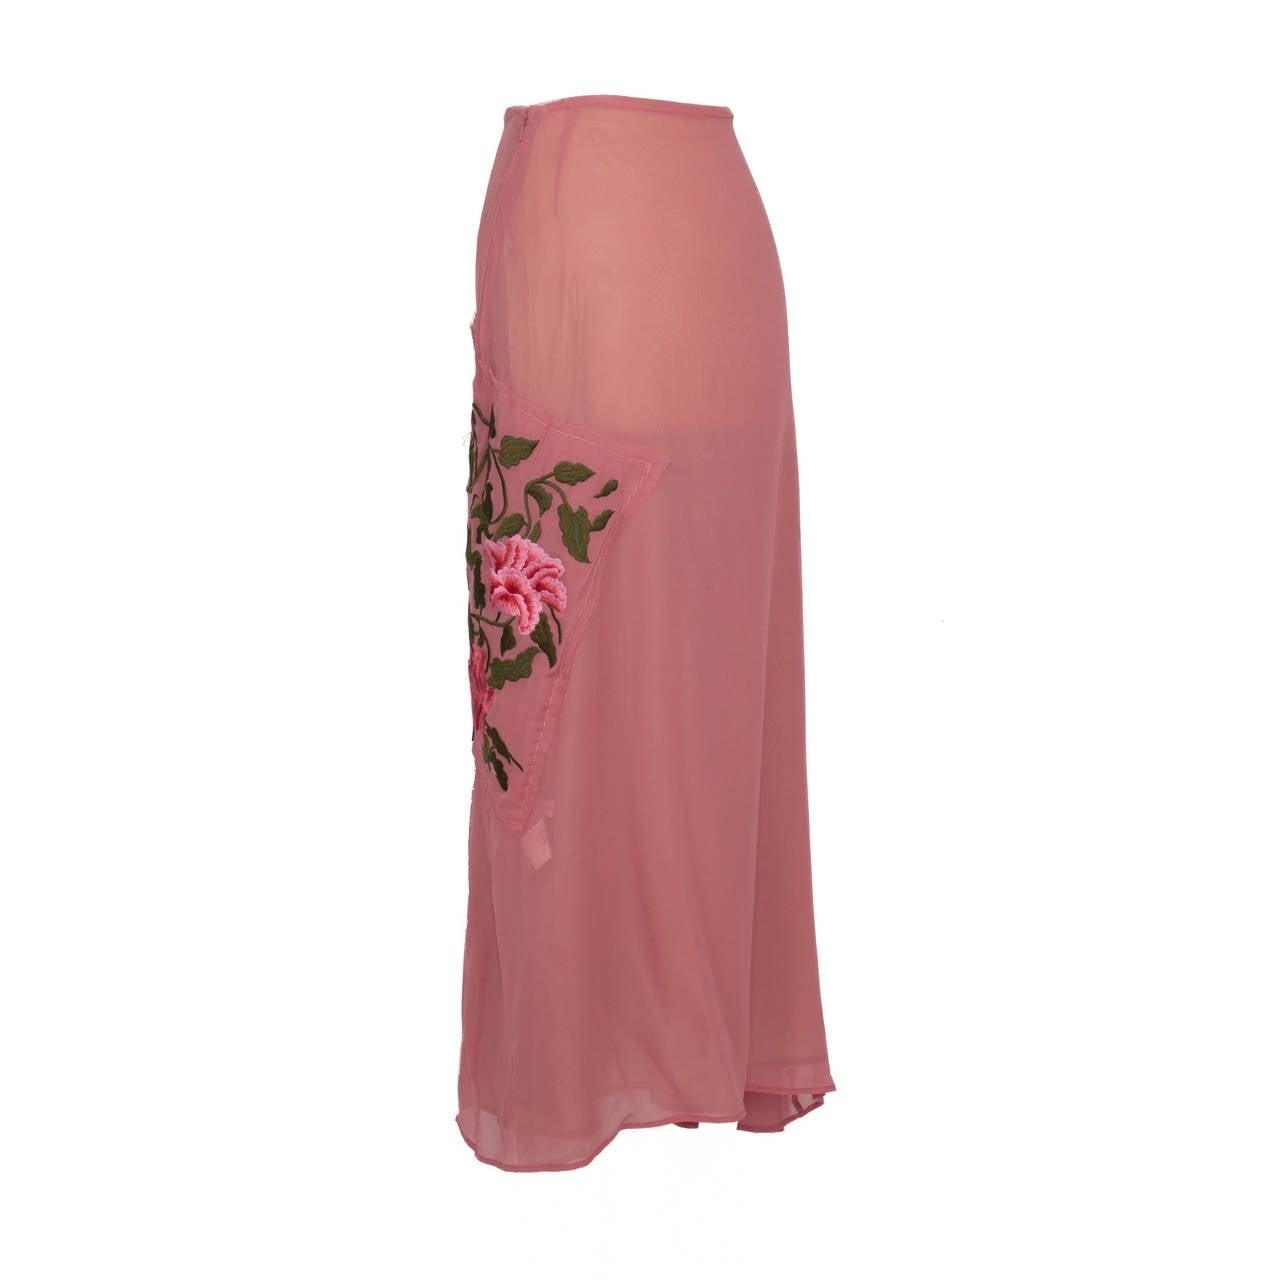 Yohji Yamamoto + Noir Pink Skirt Flower Embroidery For Sale 2